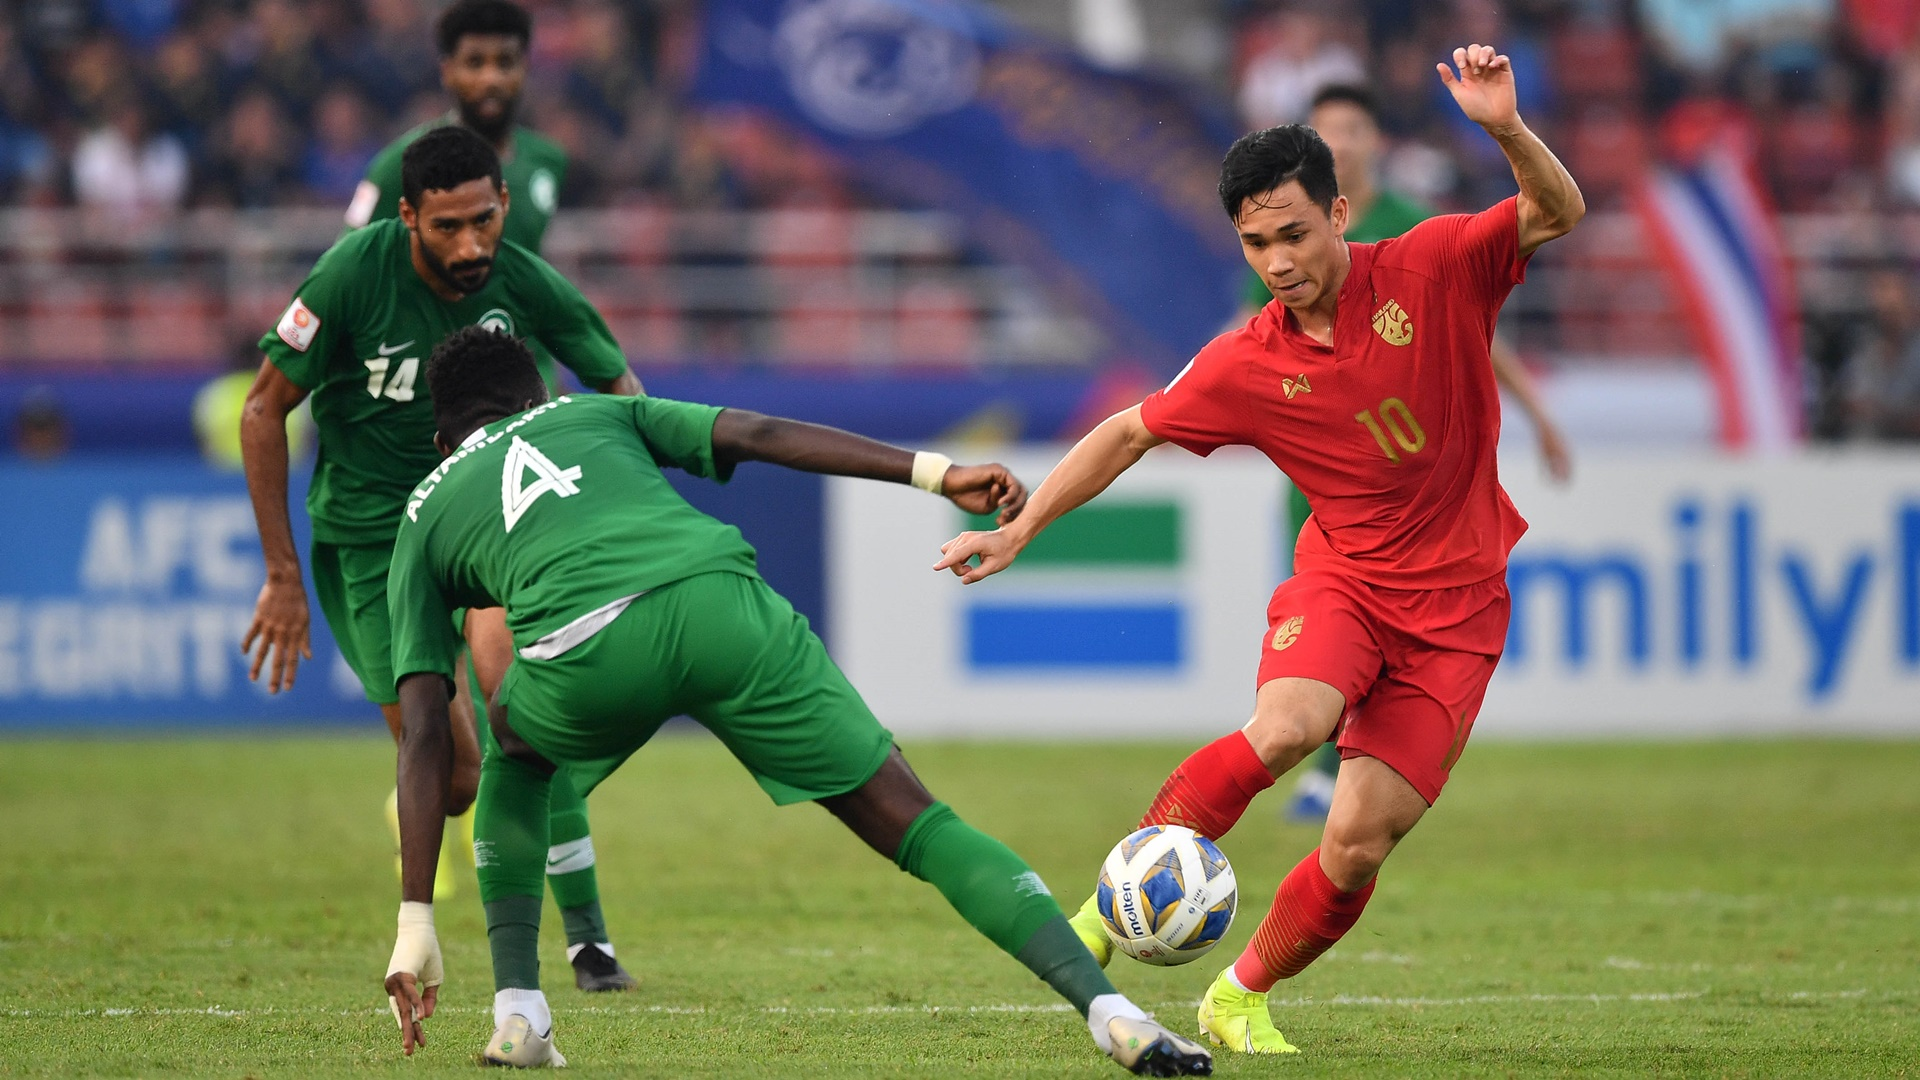 Supachok Sarachat | U23 Thailand vs U23 Saudi Arabia | AFC U23 Championship 2020 | Quarter Finals